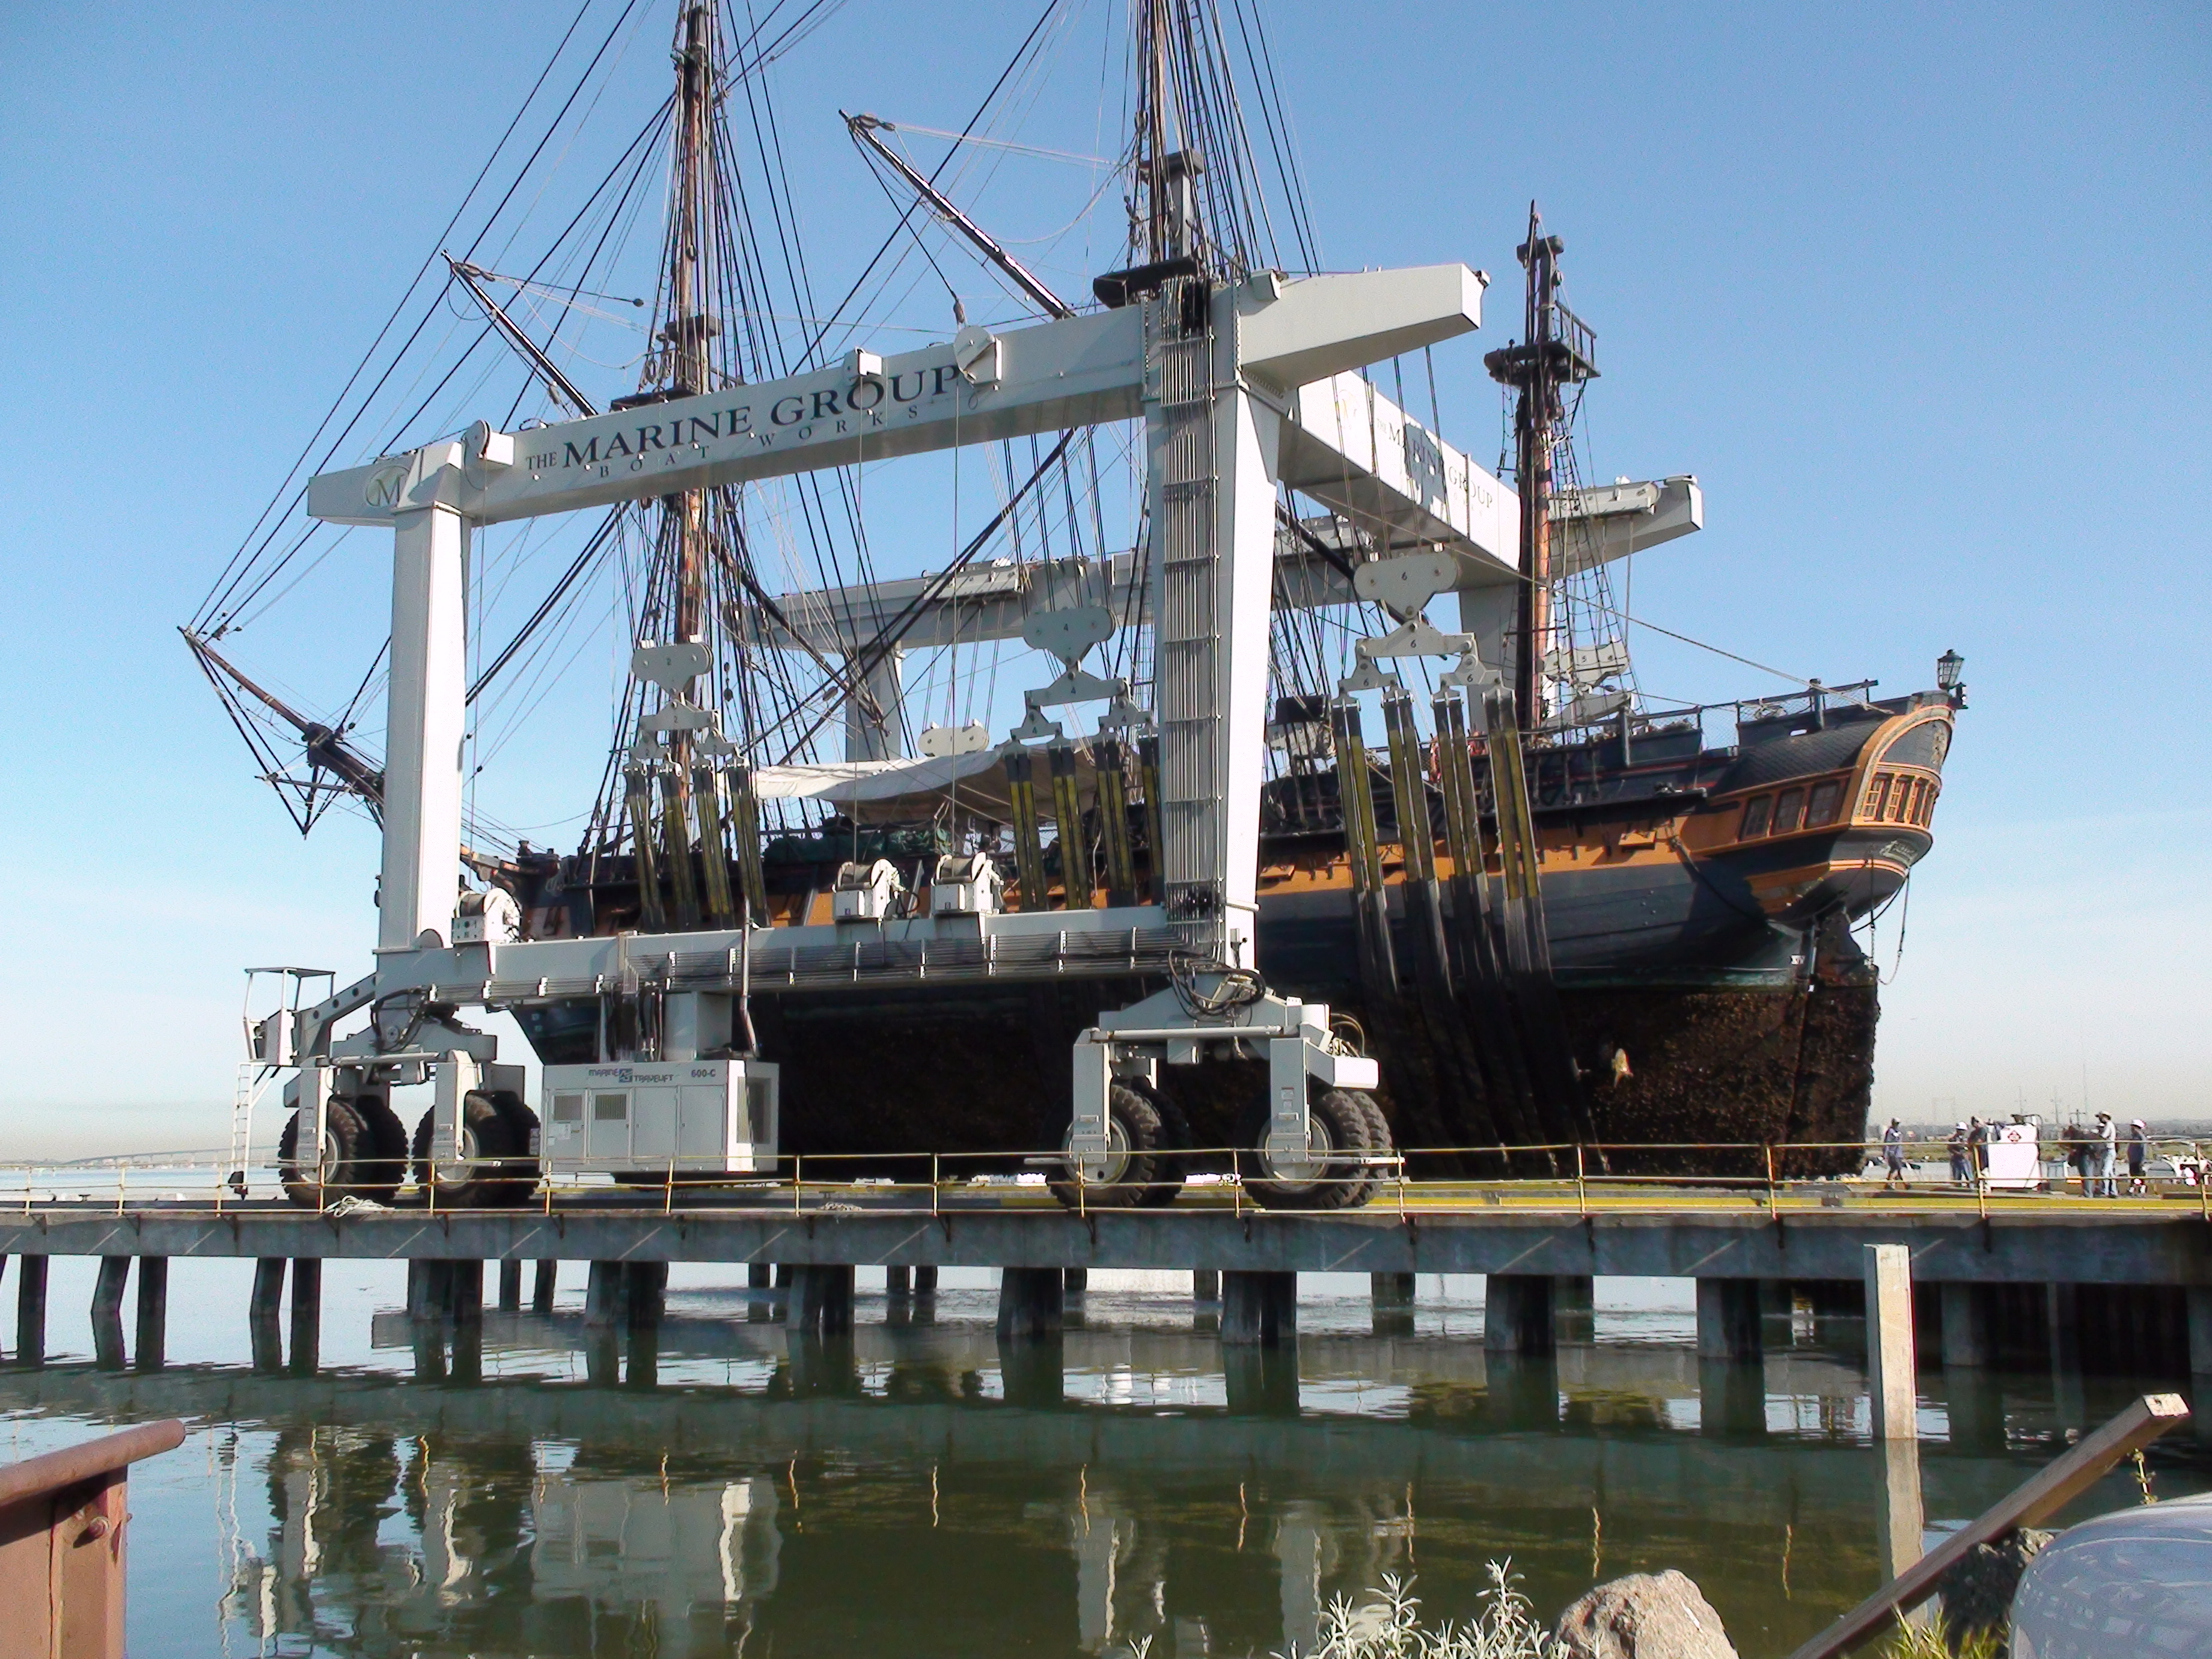 File:HMS Surprise at Chula Vista Marine Group Boat Works ...